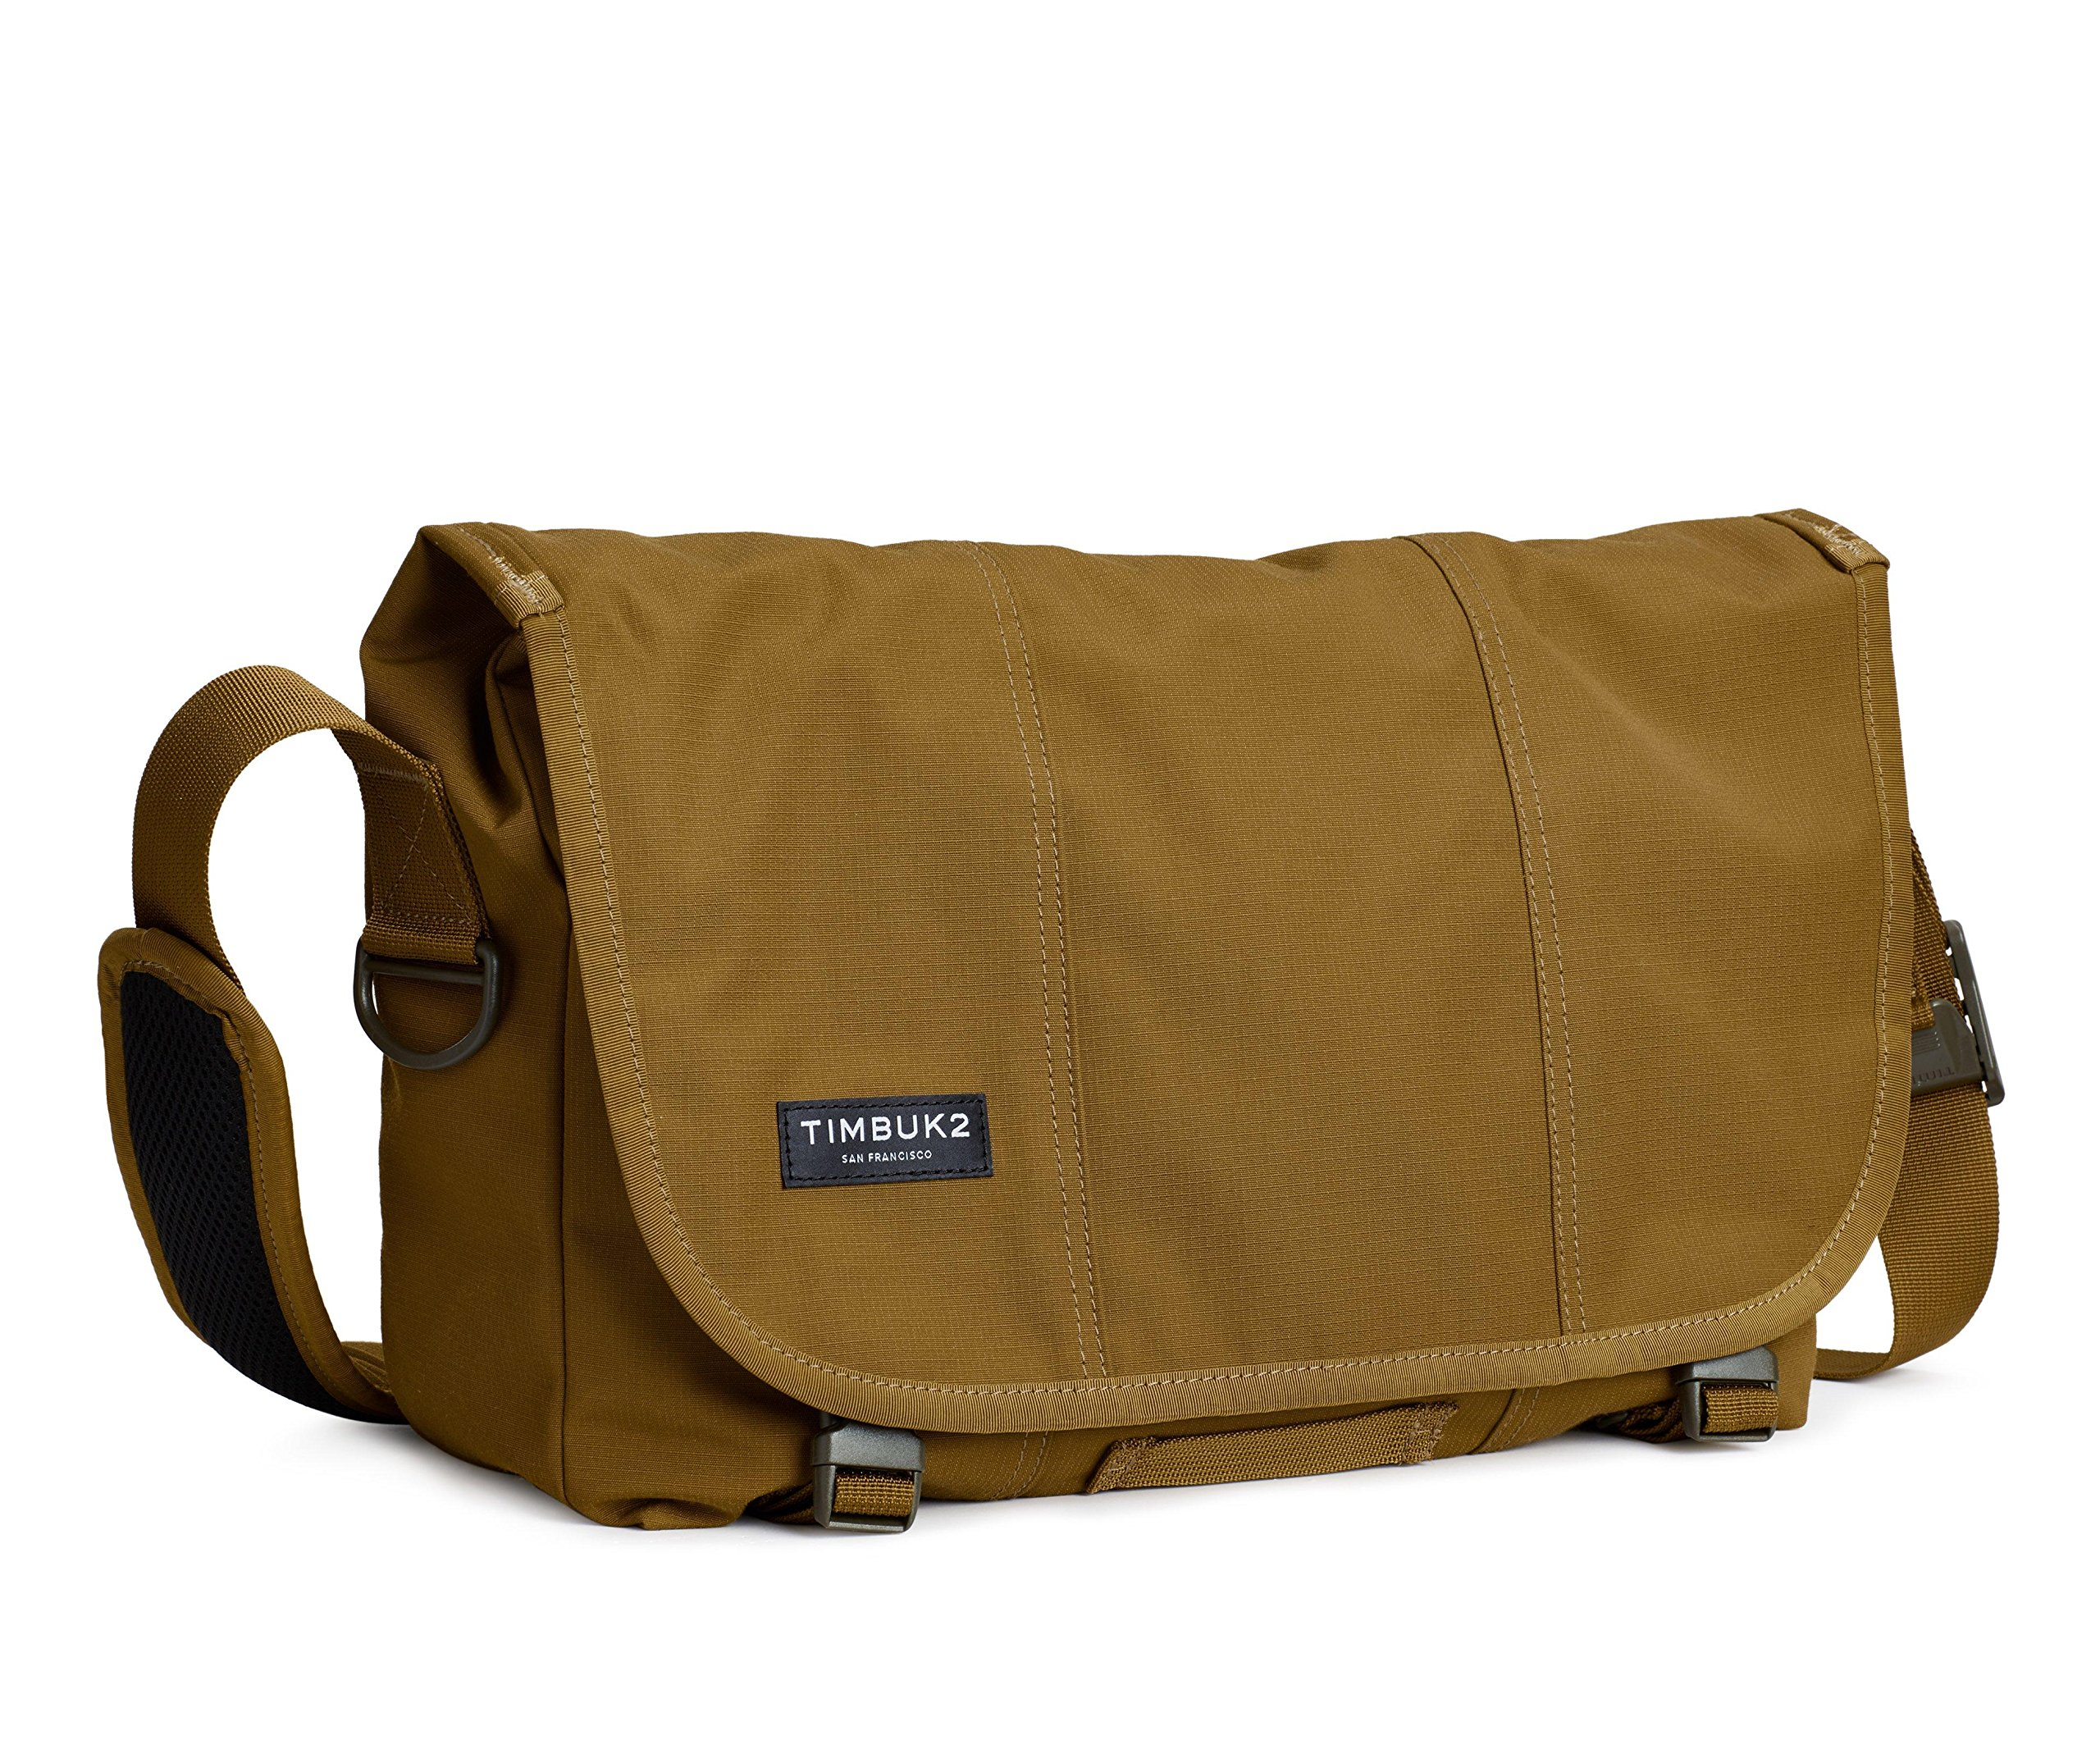 Timbuk2 Flight Classic Messenger Bag, Brass/Army, S, Brass/Army, Small